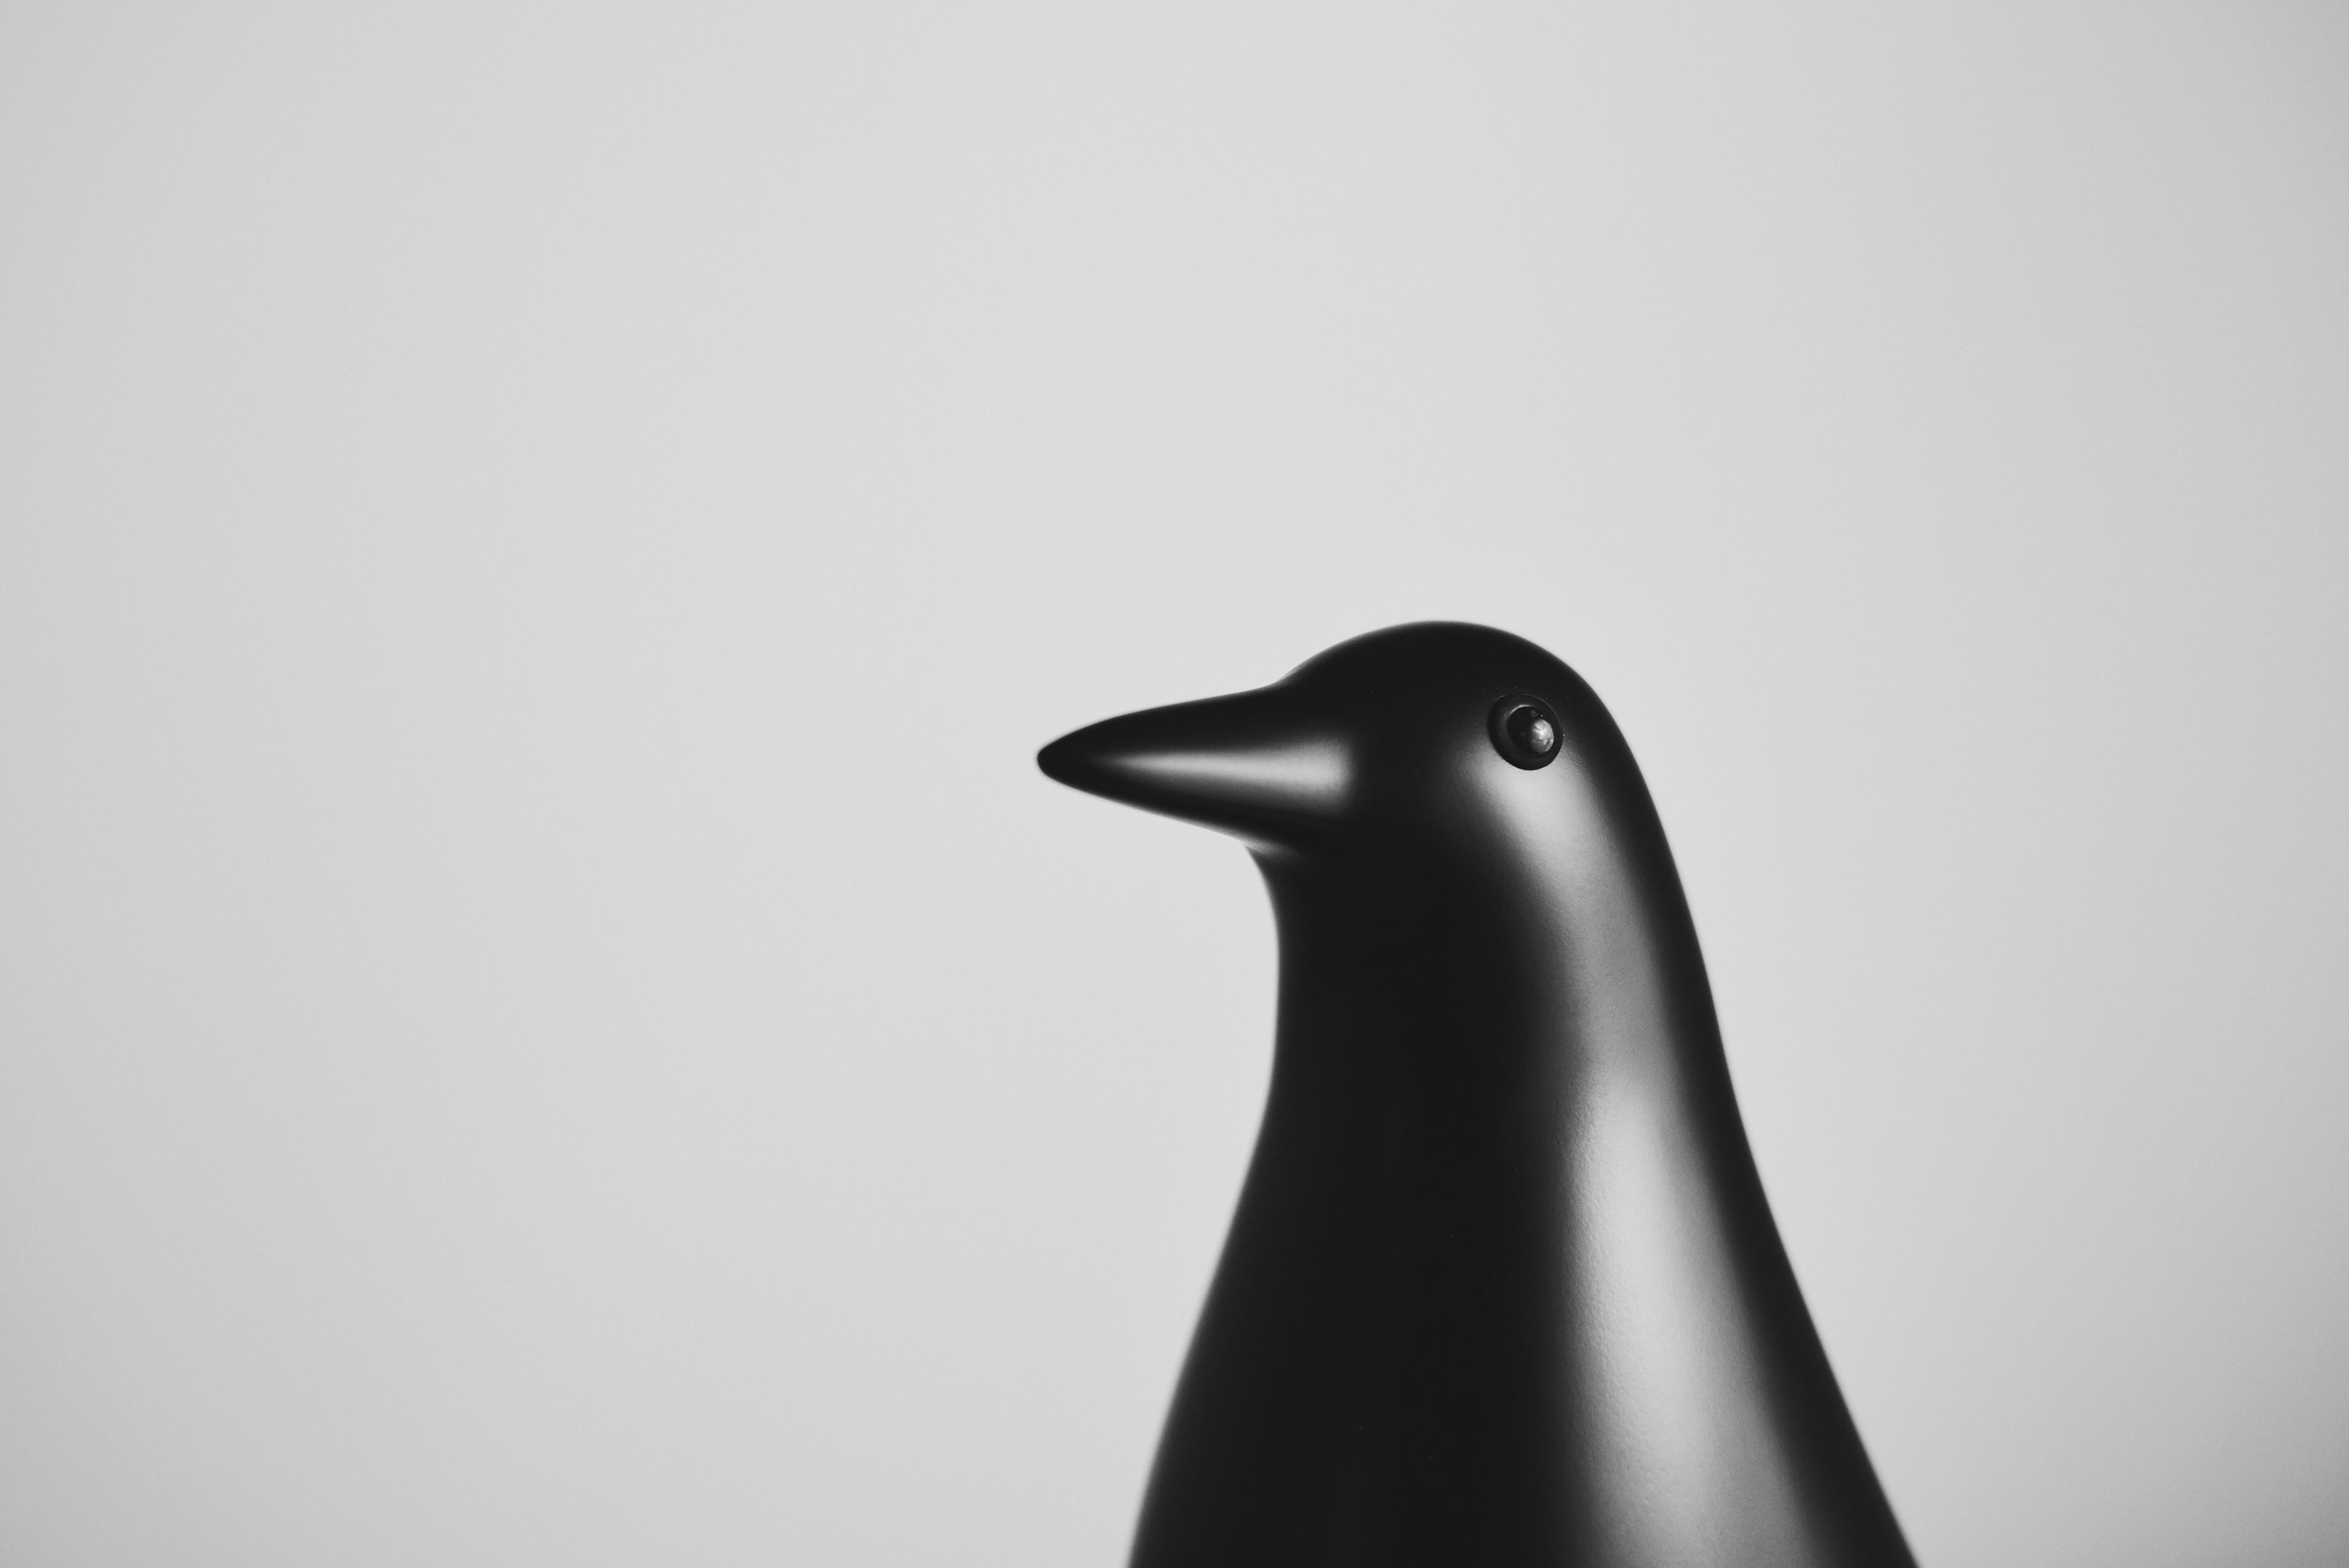 Jędrzej Franek - Objects: Vitra Eames House Bird